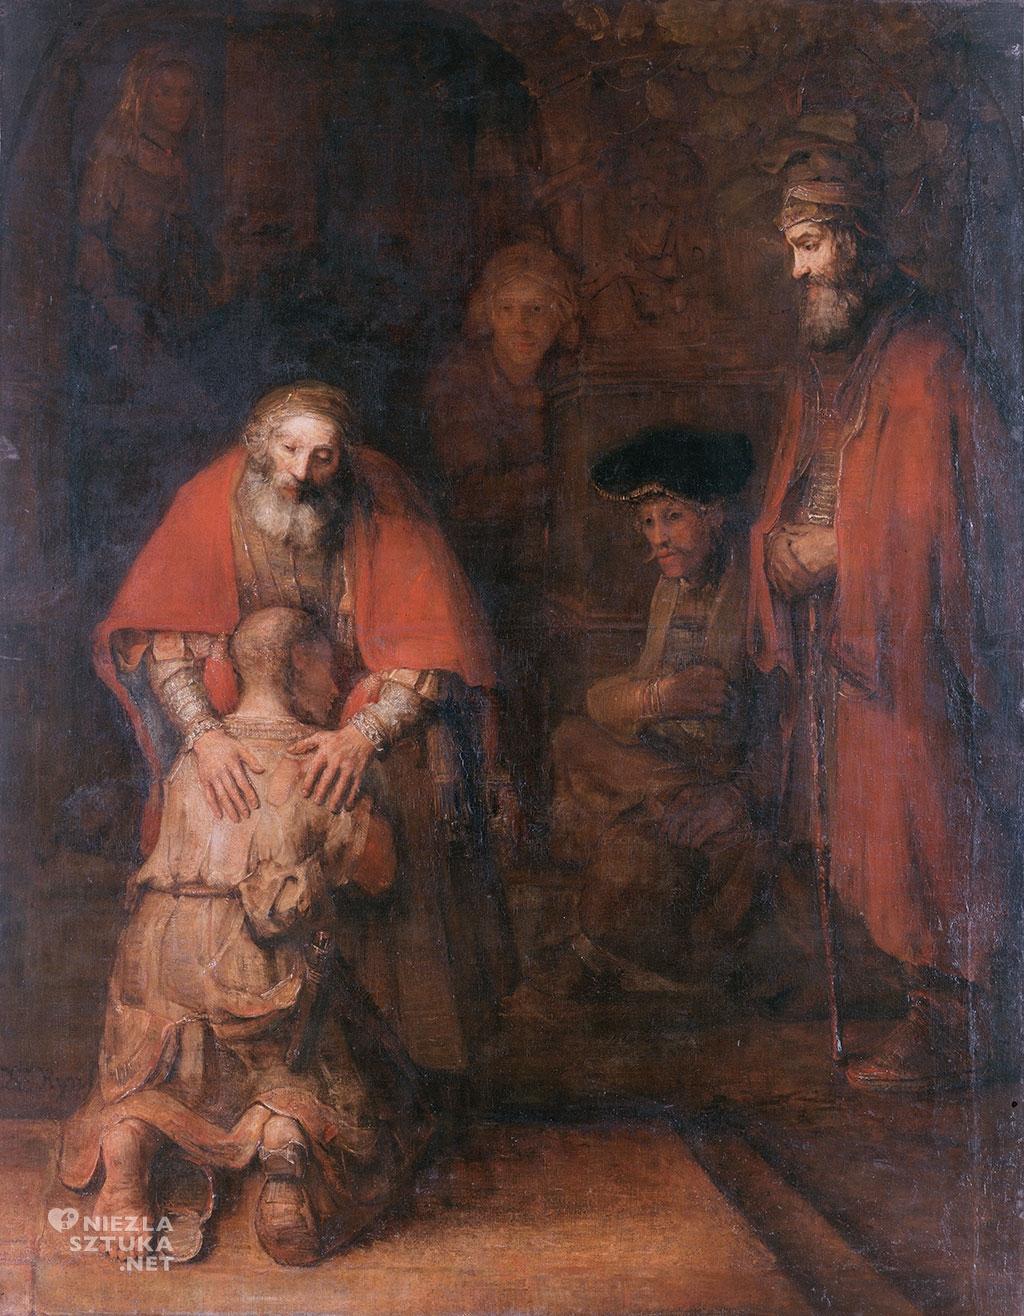 Rembrandt van Rijn <em>Powrót syna marnotrawnego</em> | 1661–1669, 262 cm × 205 cm. Hermitage Museum, Petersburg